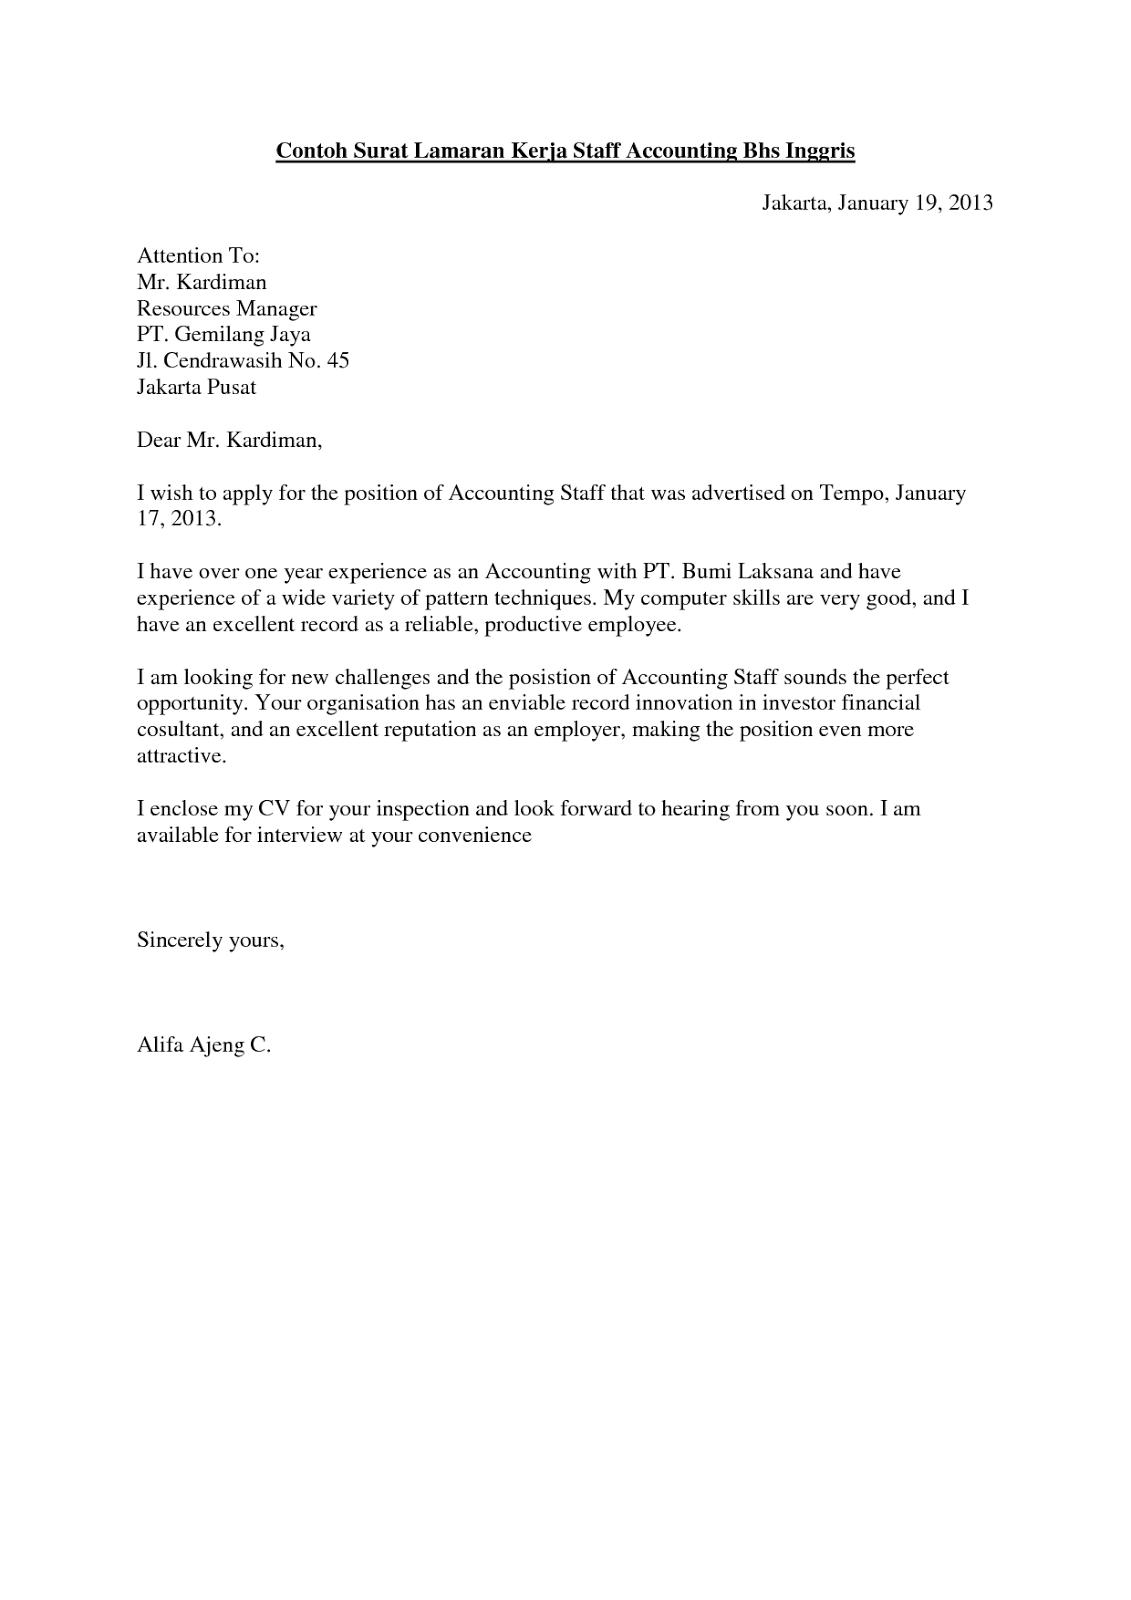 Contoh Application Letter Fresh Graduate Yang Bagus Surat